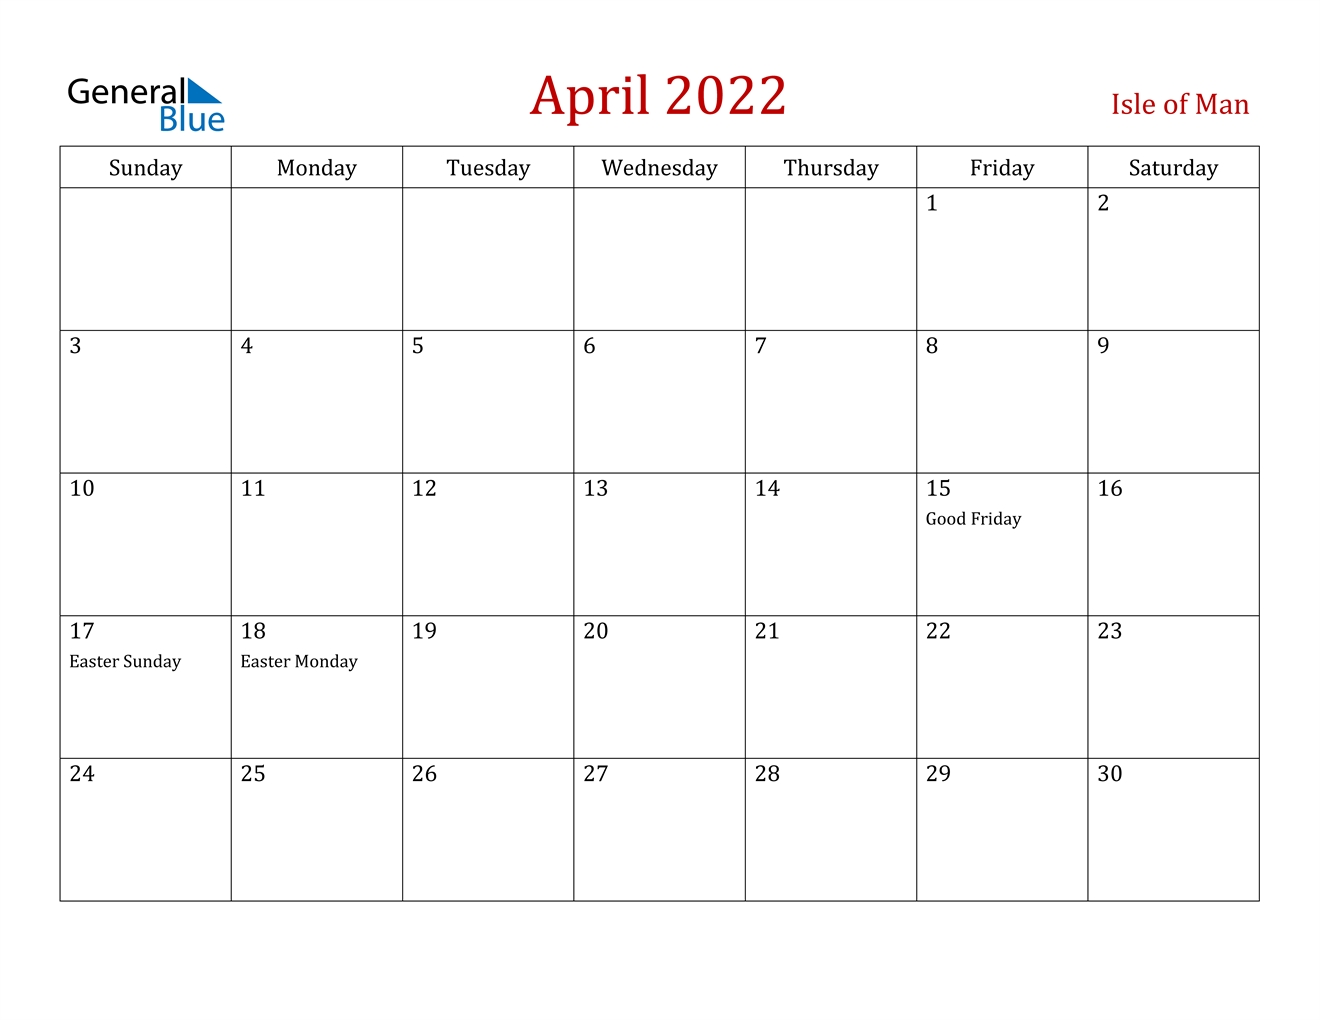 April 2022 Calendar - Isle Of Man